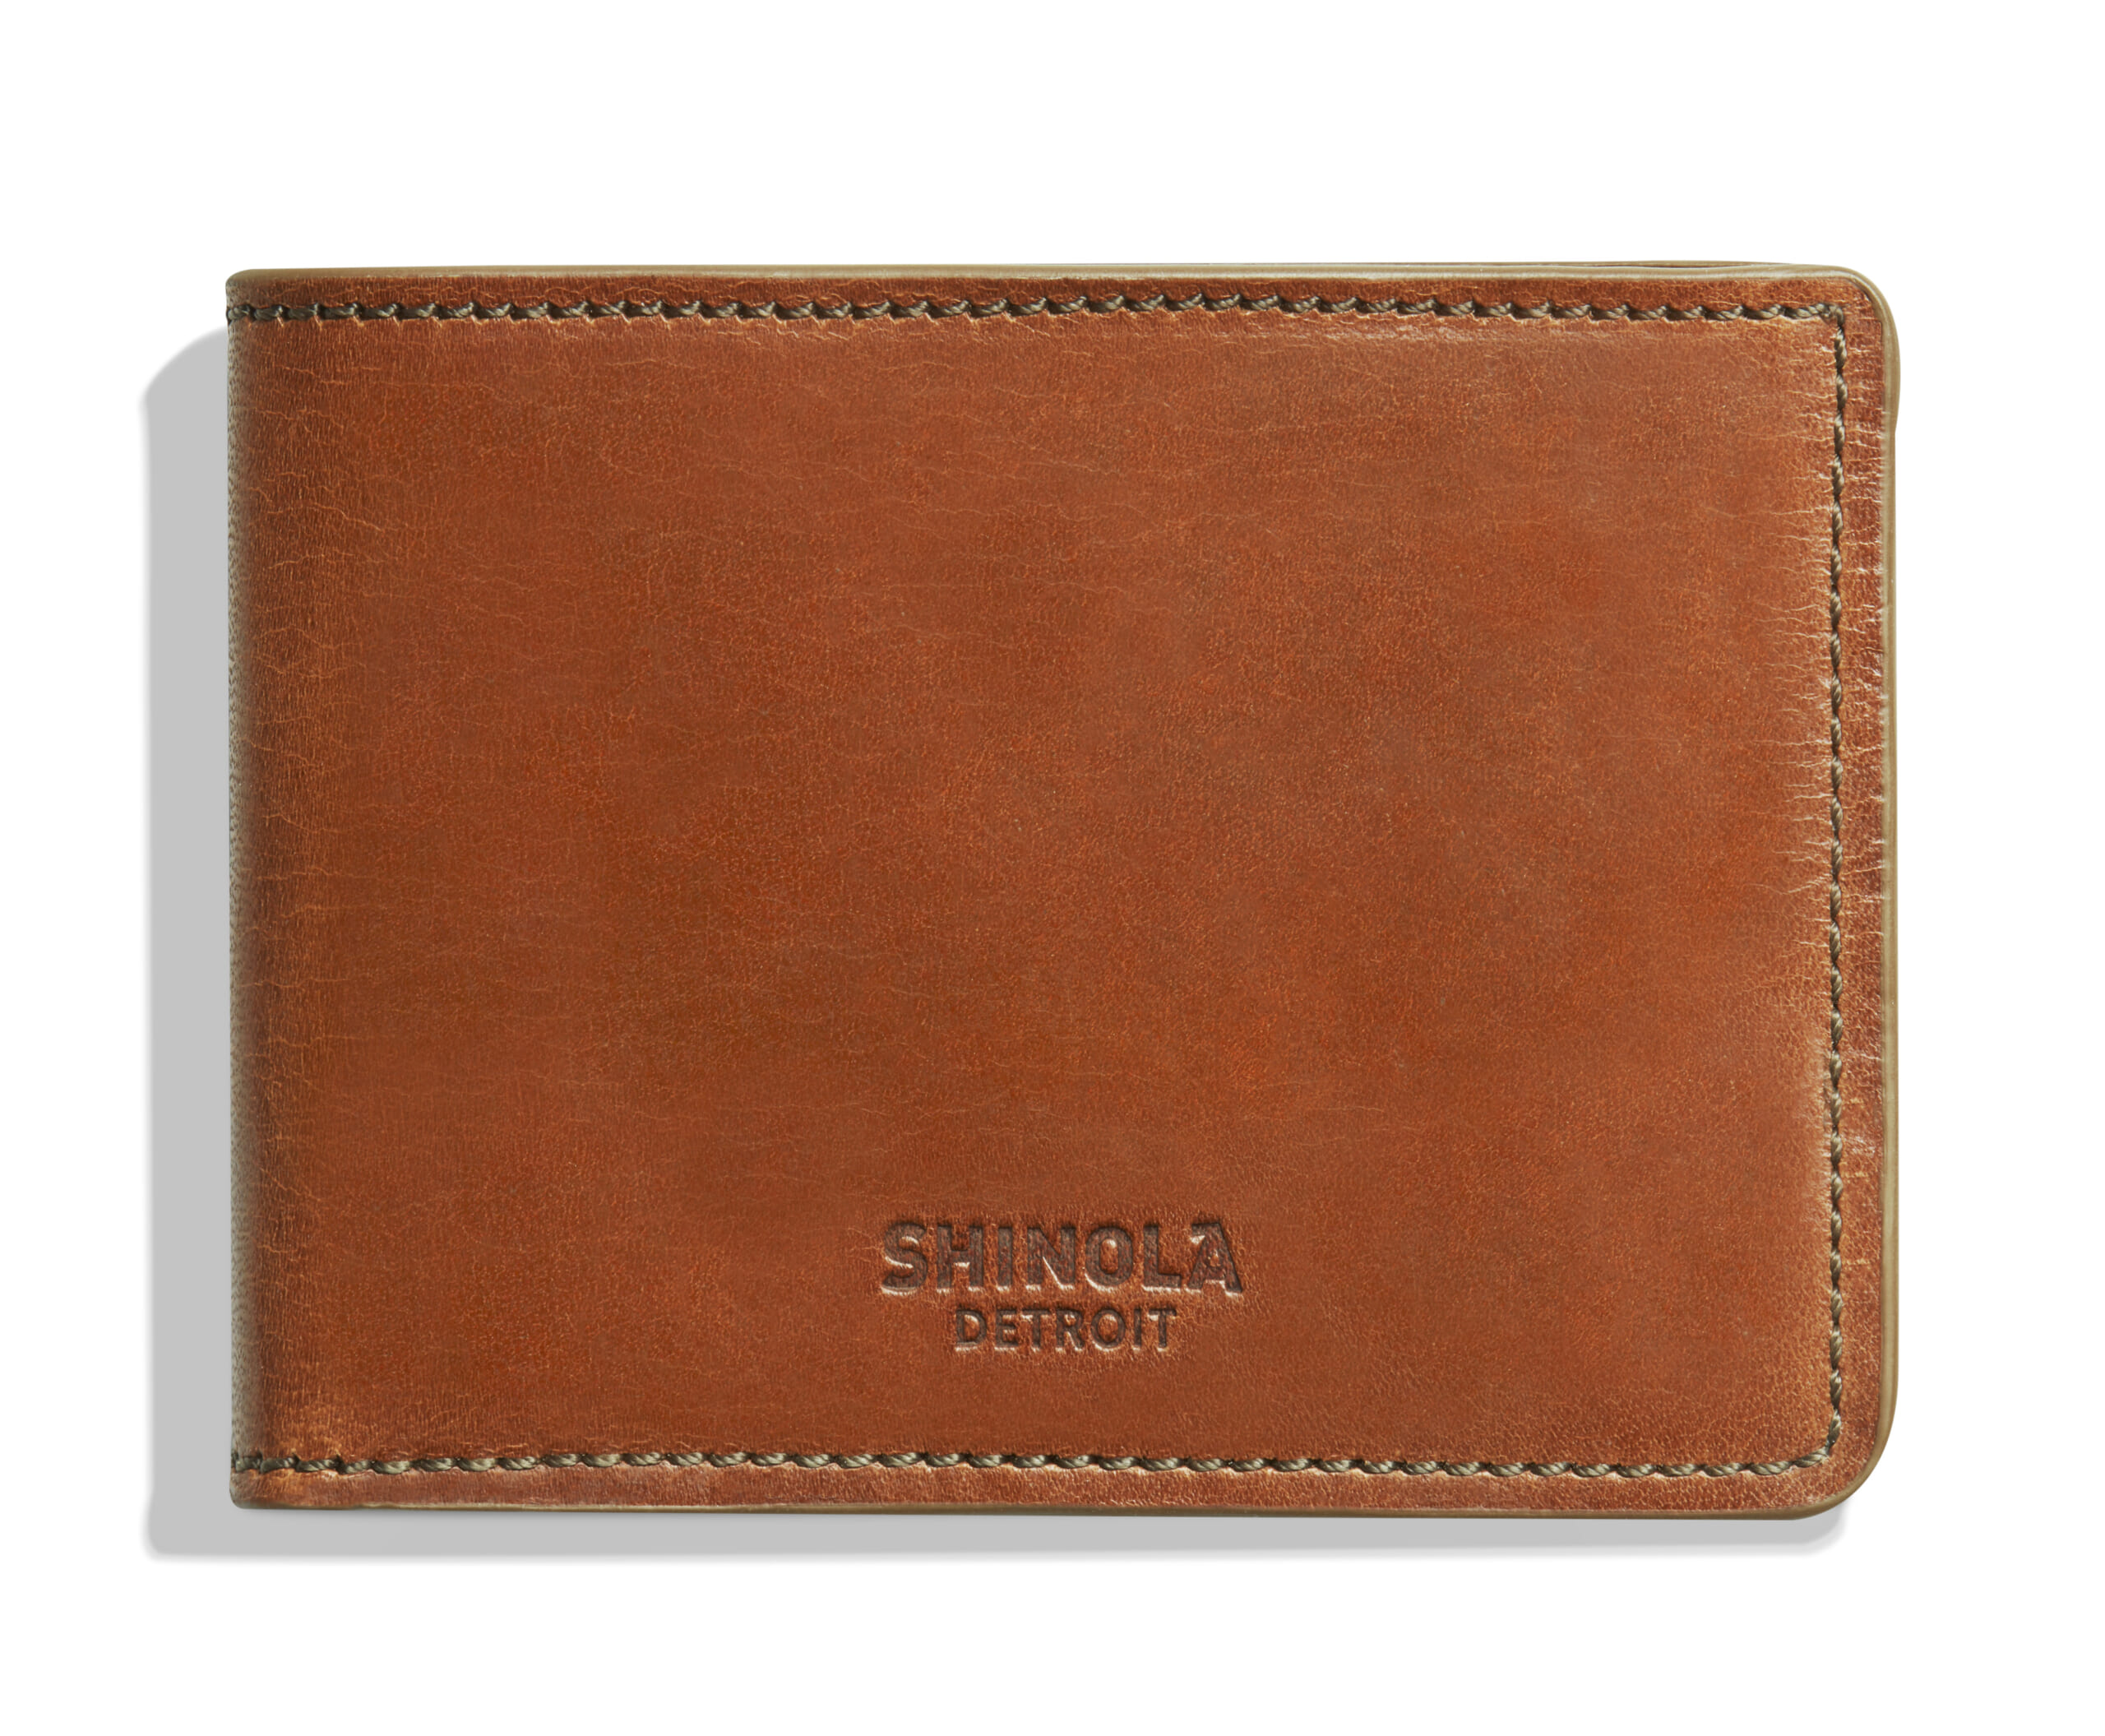 Shinola wallet